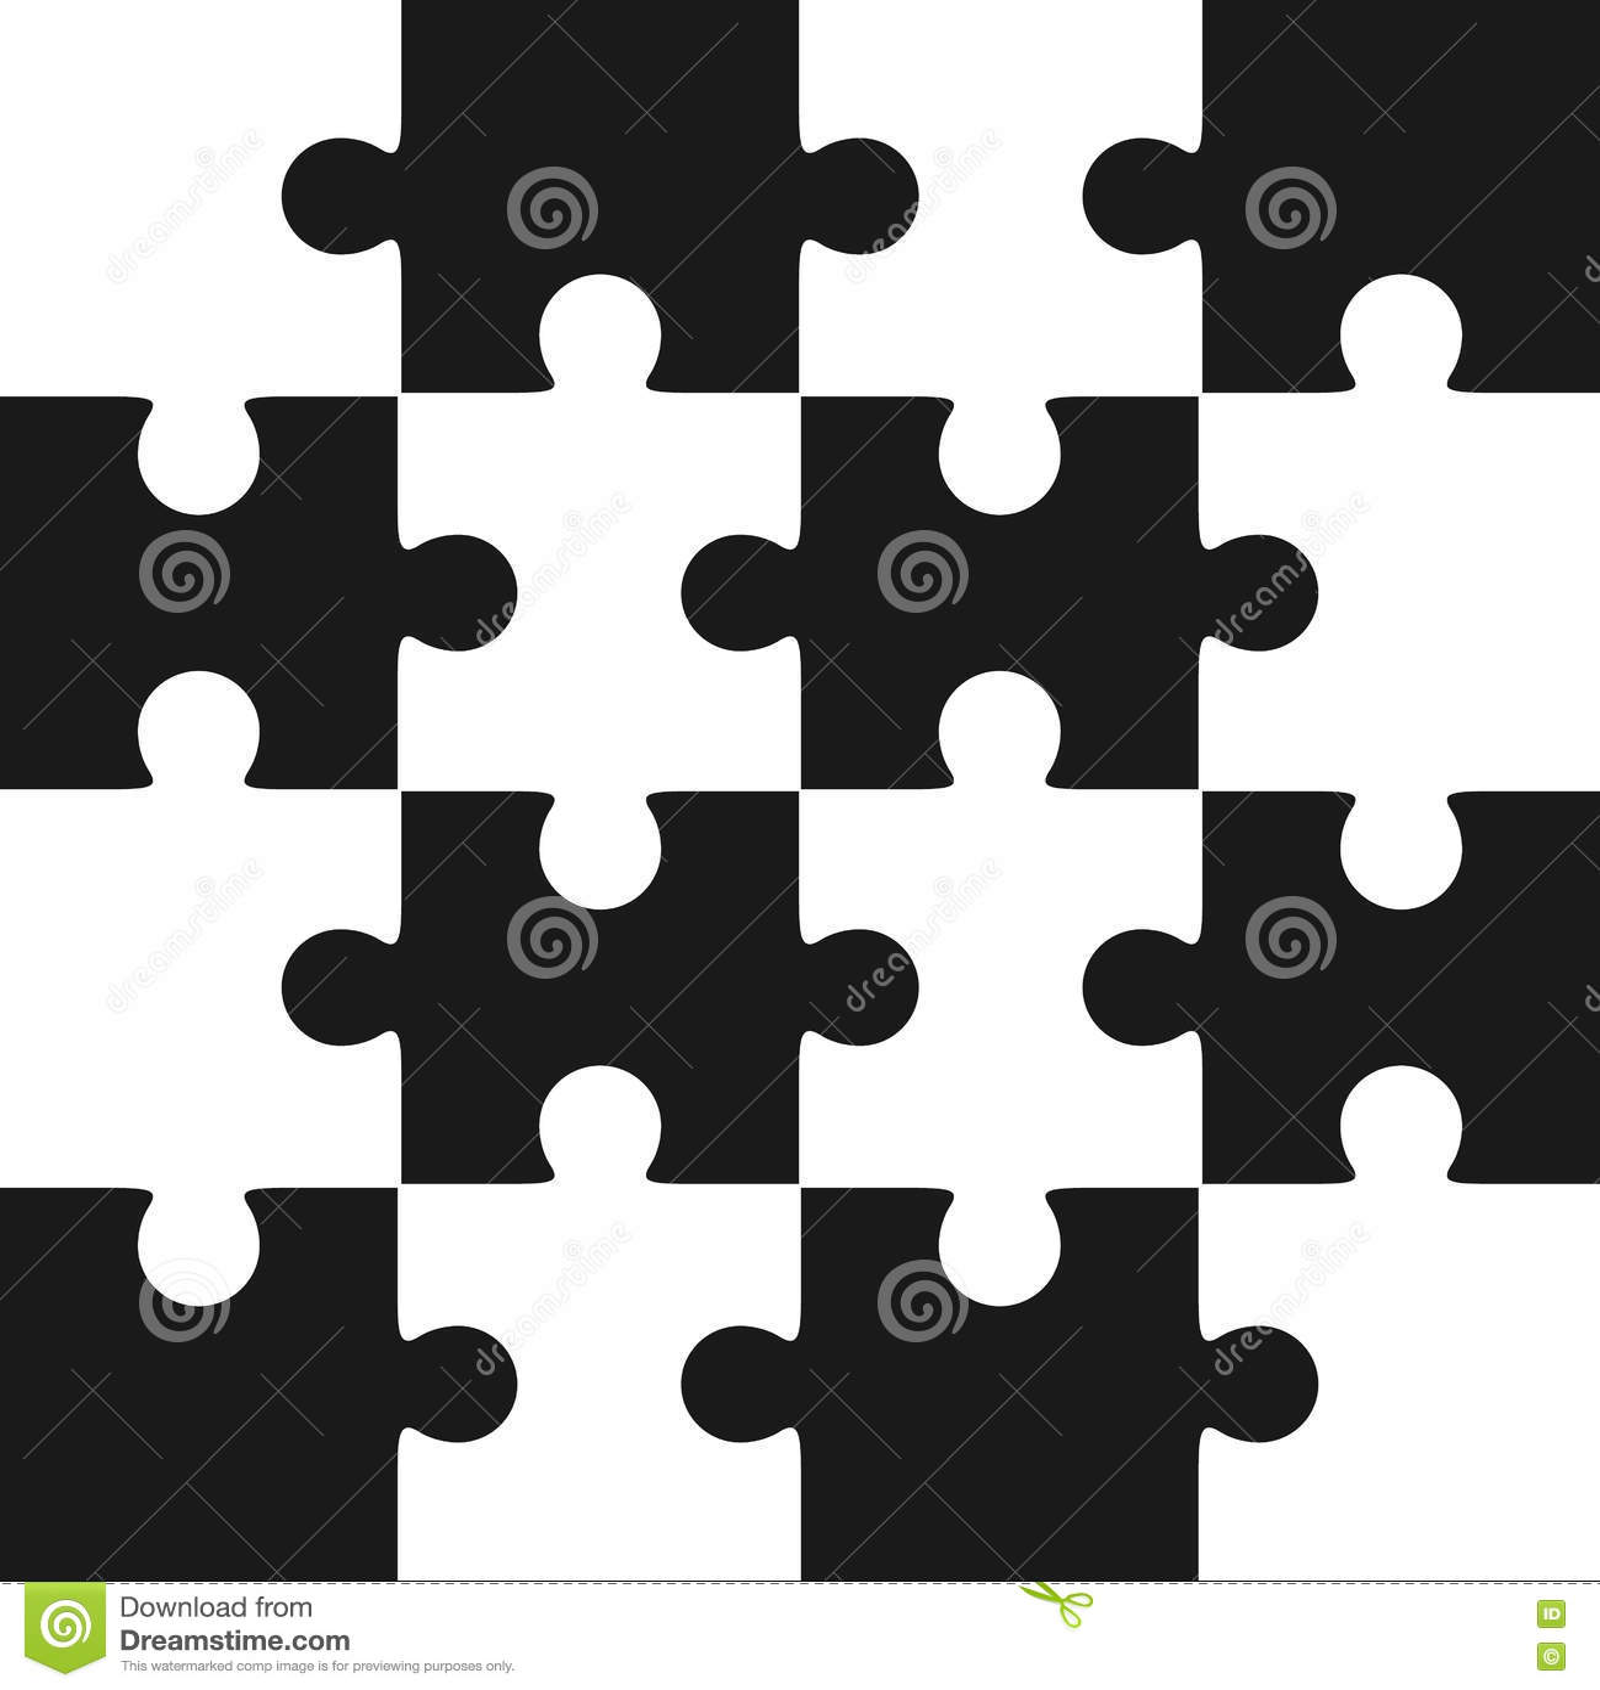 Jigsaw Puzzle Blank Template Sixteen Elements Stock Vector ...